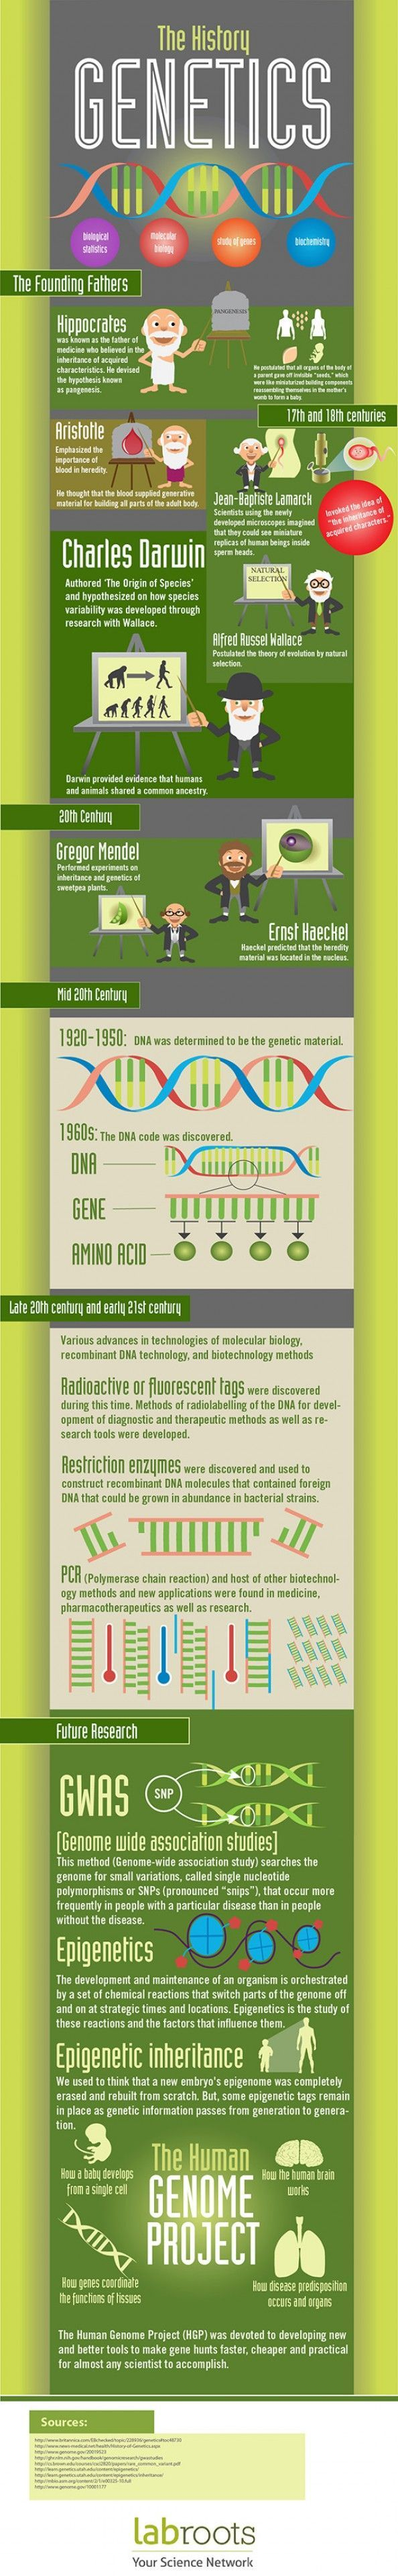 The History of Genetics Infographic